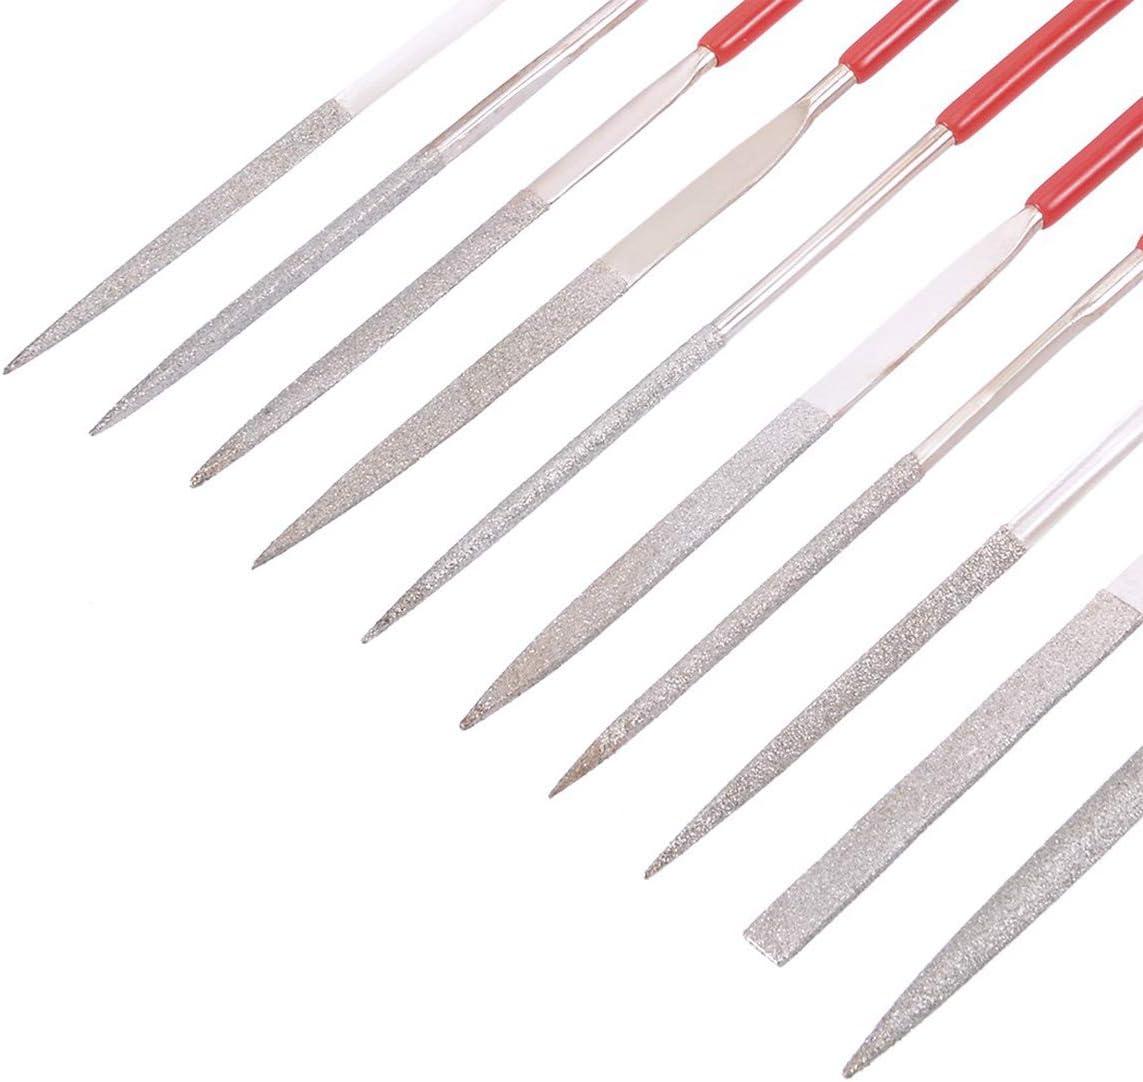 Sliver+Red 140MM x 3MM Rasp Diamond Coated Needle File Set Titanium for Filing Cutting Tool Sliver 10PCS